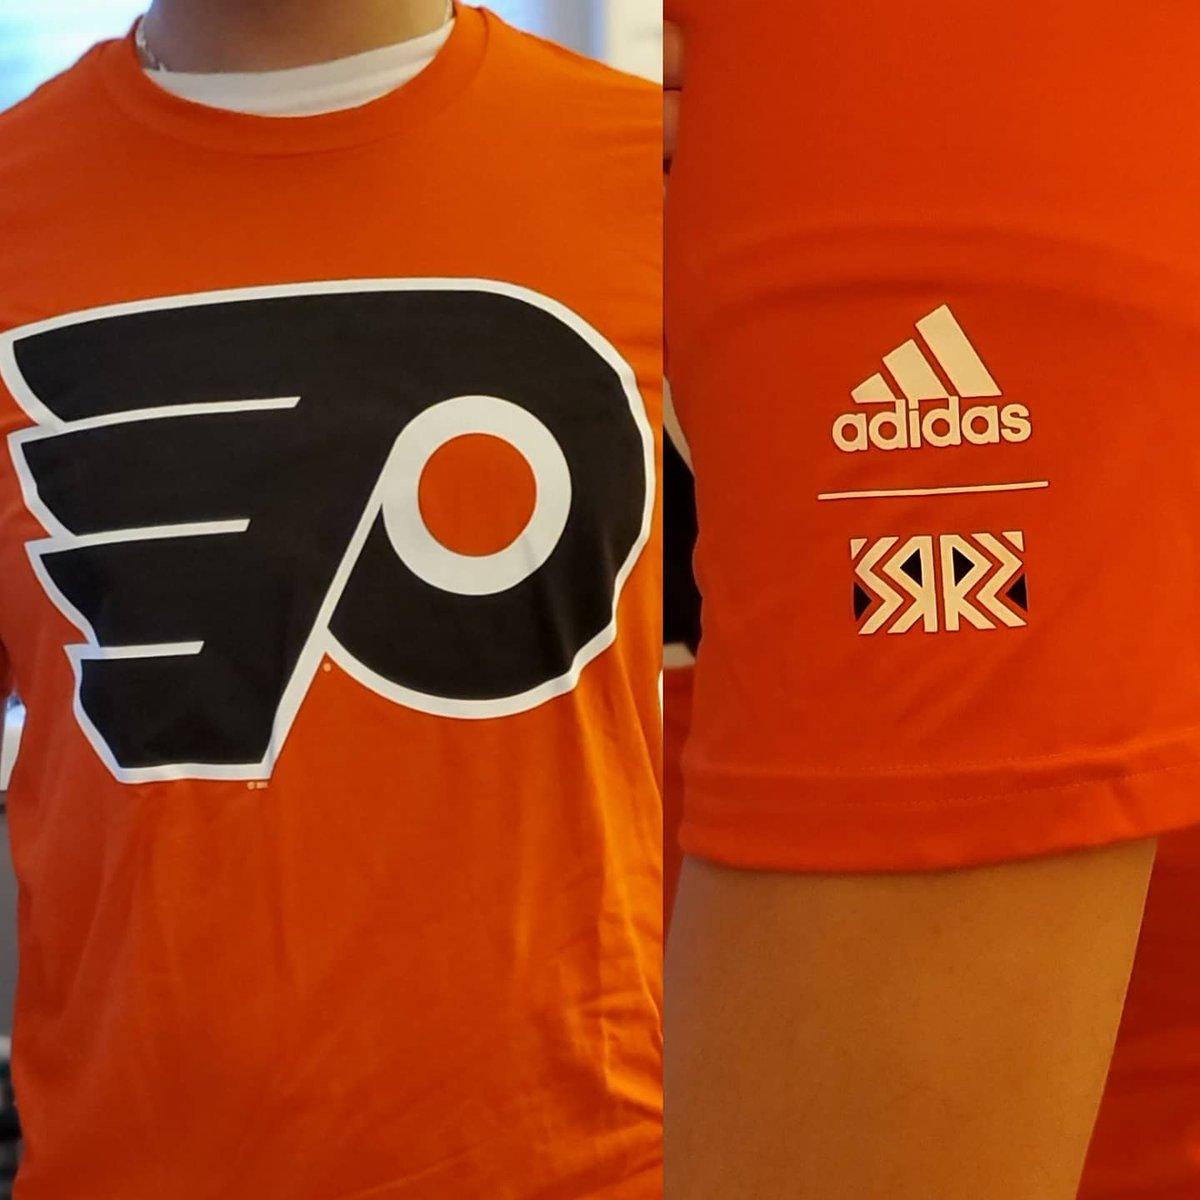 🚨Reverse Retro Giveaway🚨 We're giving away SIX @NHLFlyers RR moisture-wicking blend T-Shirts. To enter, follow & retweet. Bonus entries for following each of the following on Twitter/Instagram: @SnowTheGoalie @AntSanPhilly @JoyOnBroad  Facebook:  #Flyers